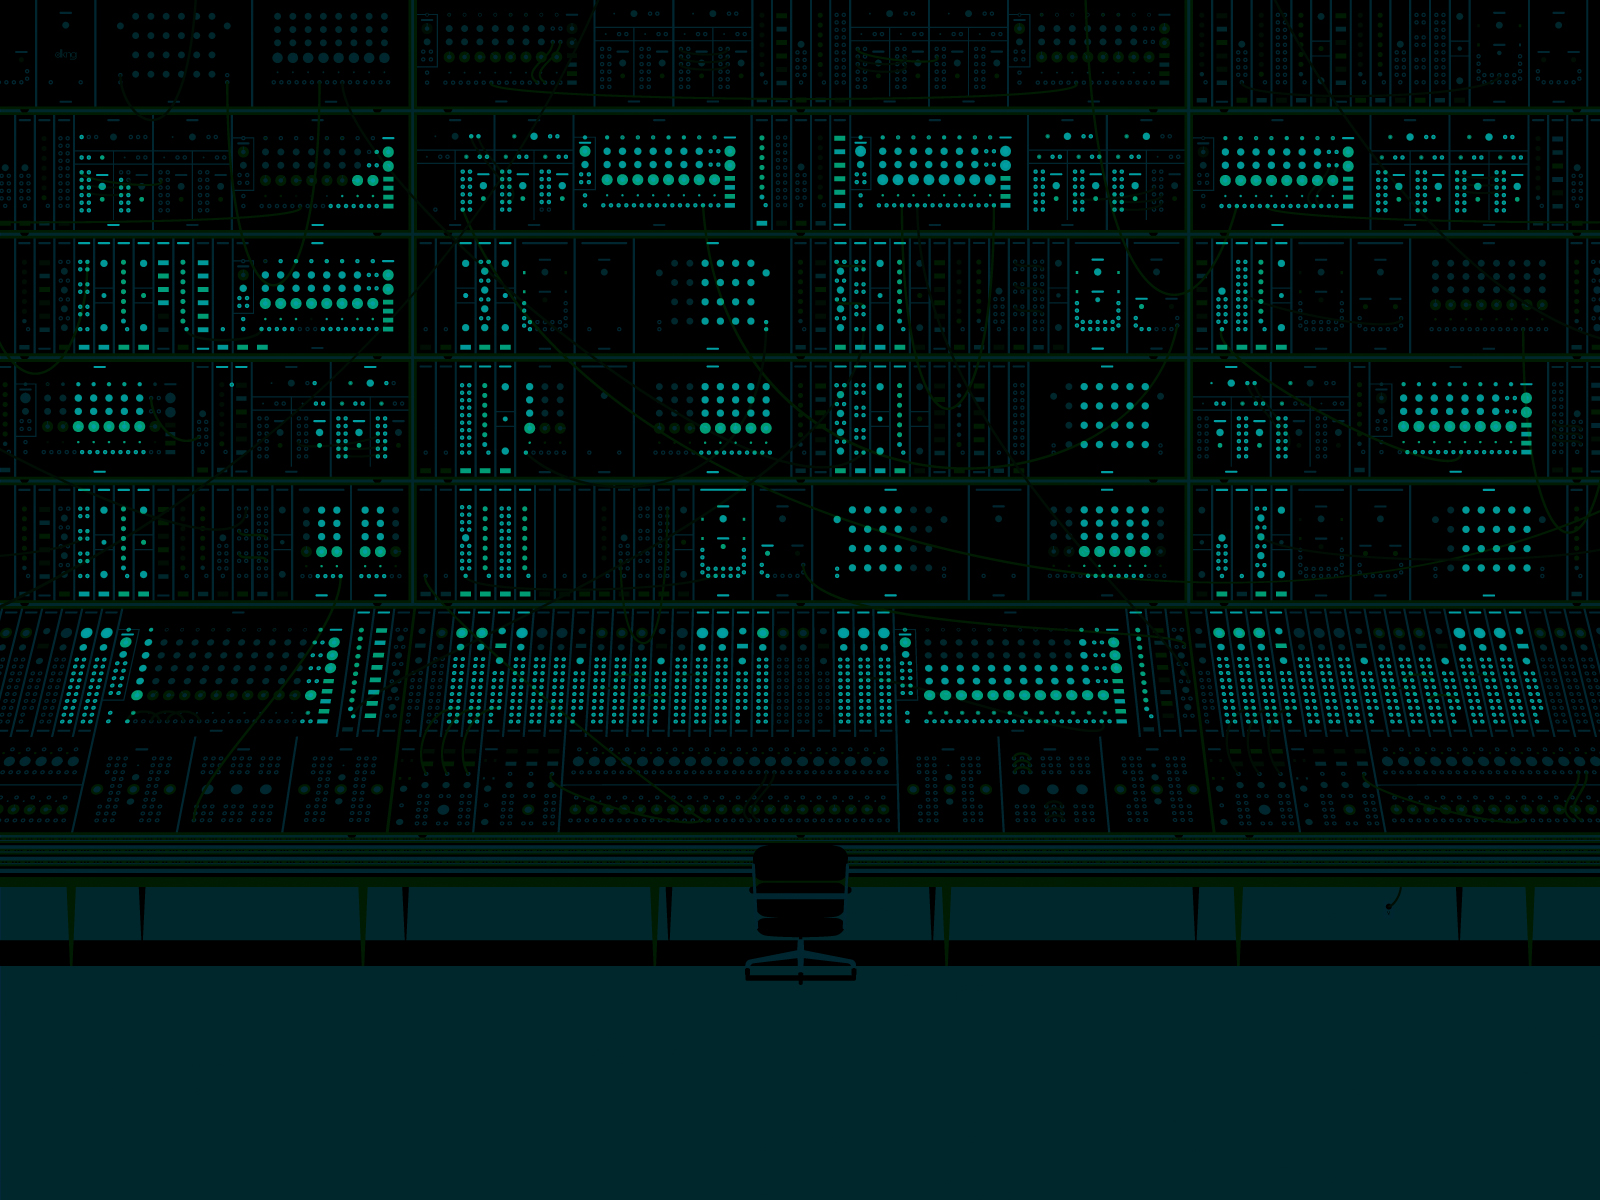 moog_console_design_gitd.jpg